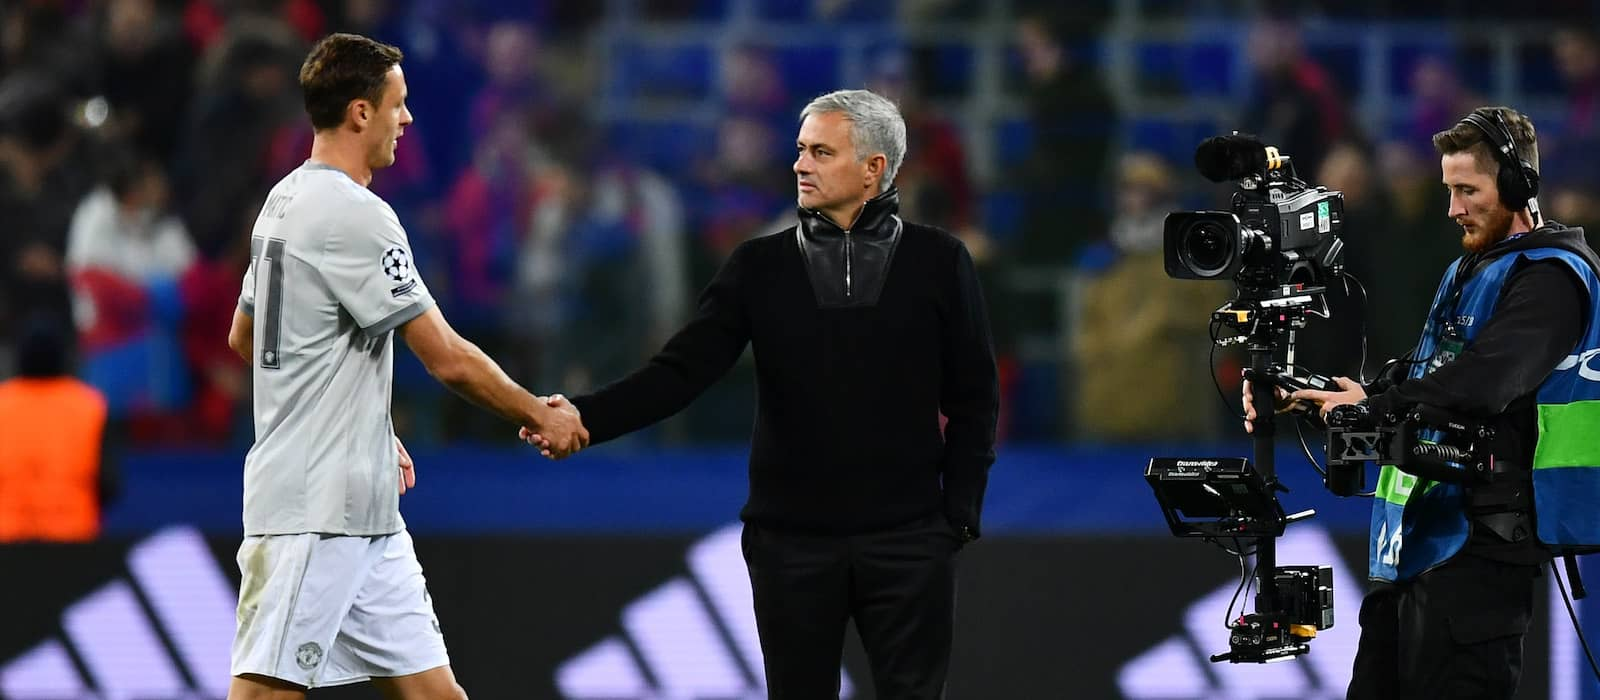 Jamie Redknapp: Jose Mourinho will not turn things around at Manchester United